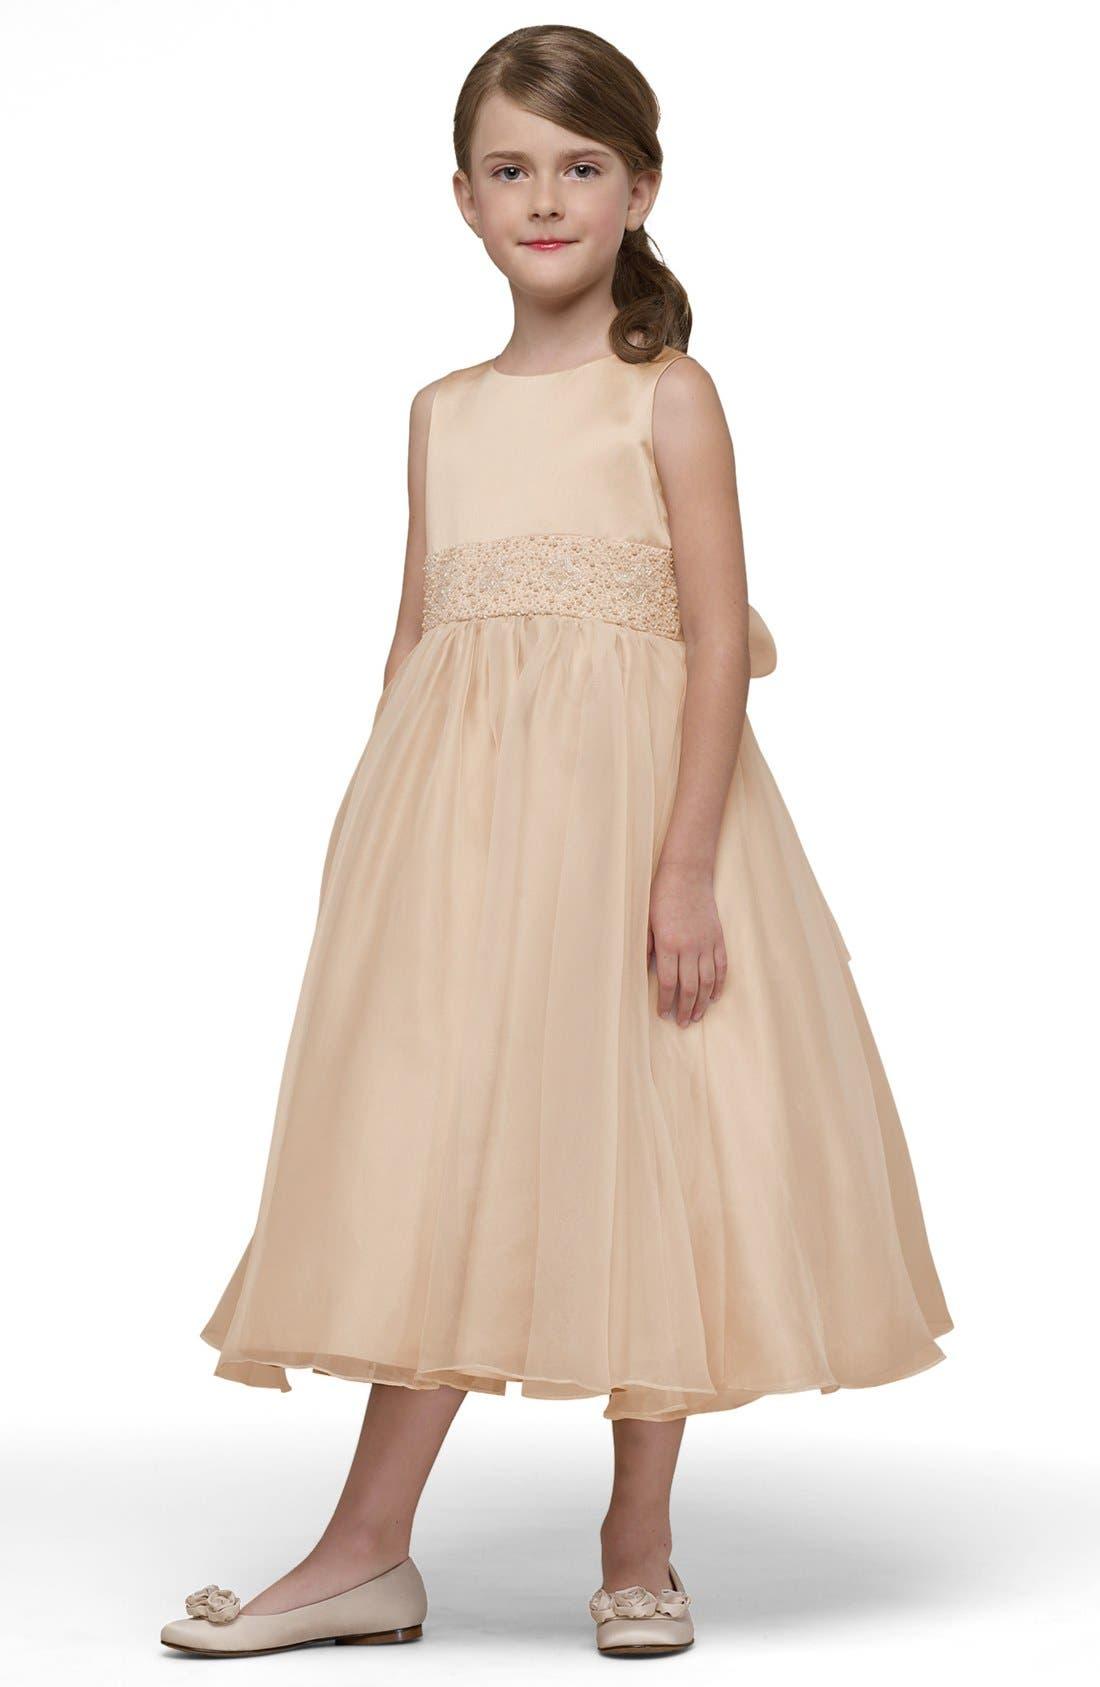 US ANGELS Beaded Satin Sleeveless Dress